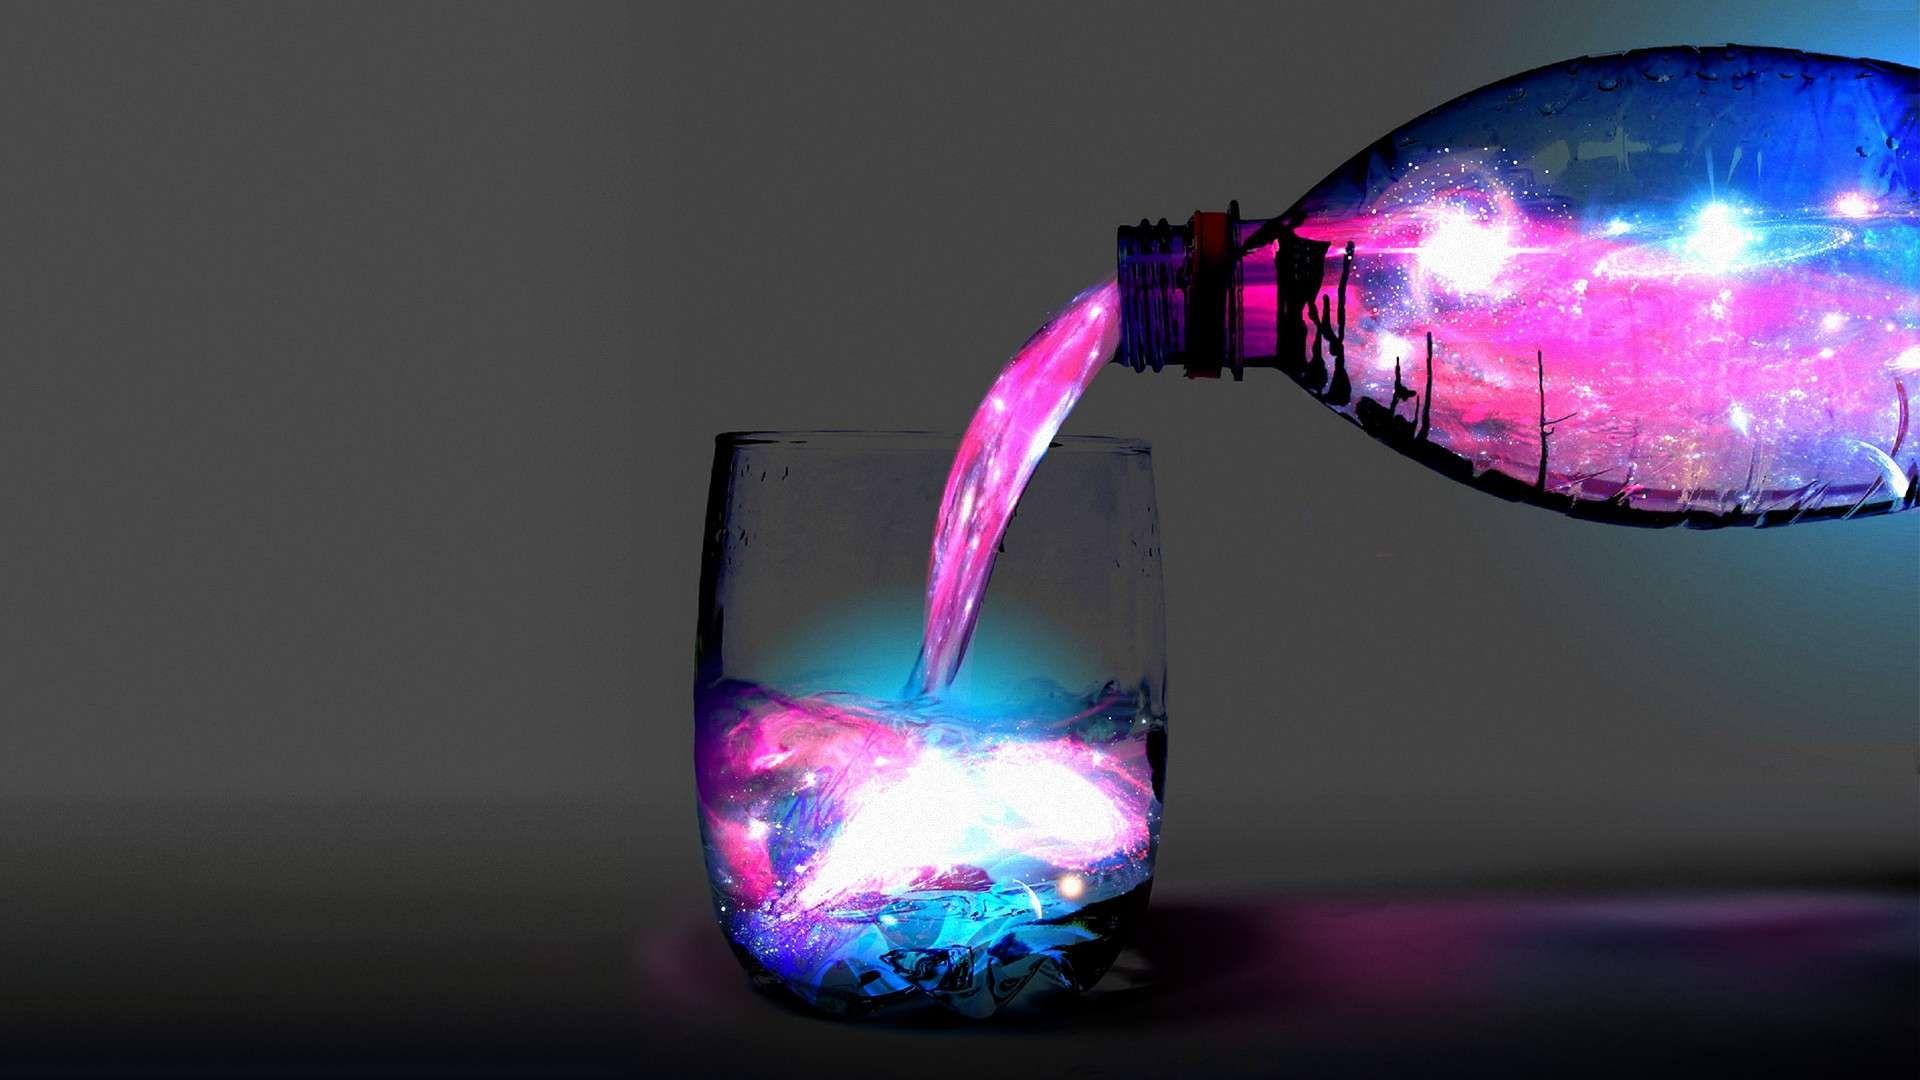 Magic Wallpaper Magic Water Hd Wallpaper Proyectos De